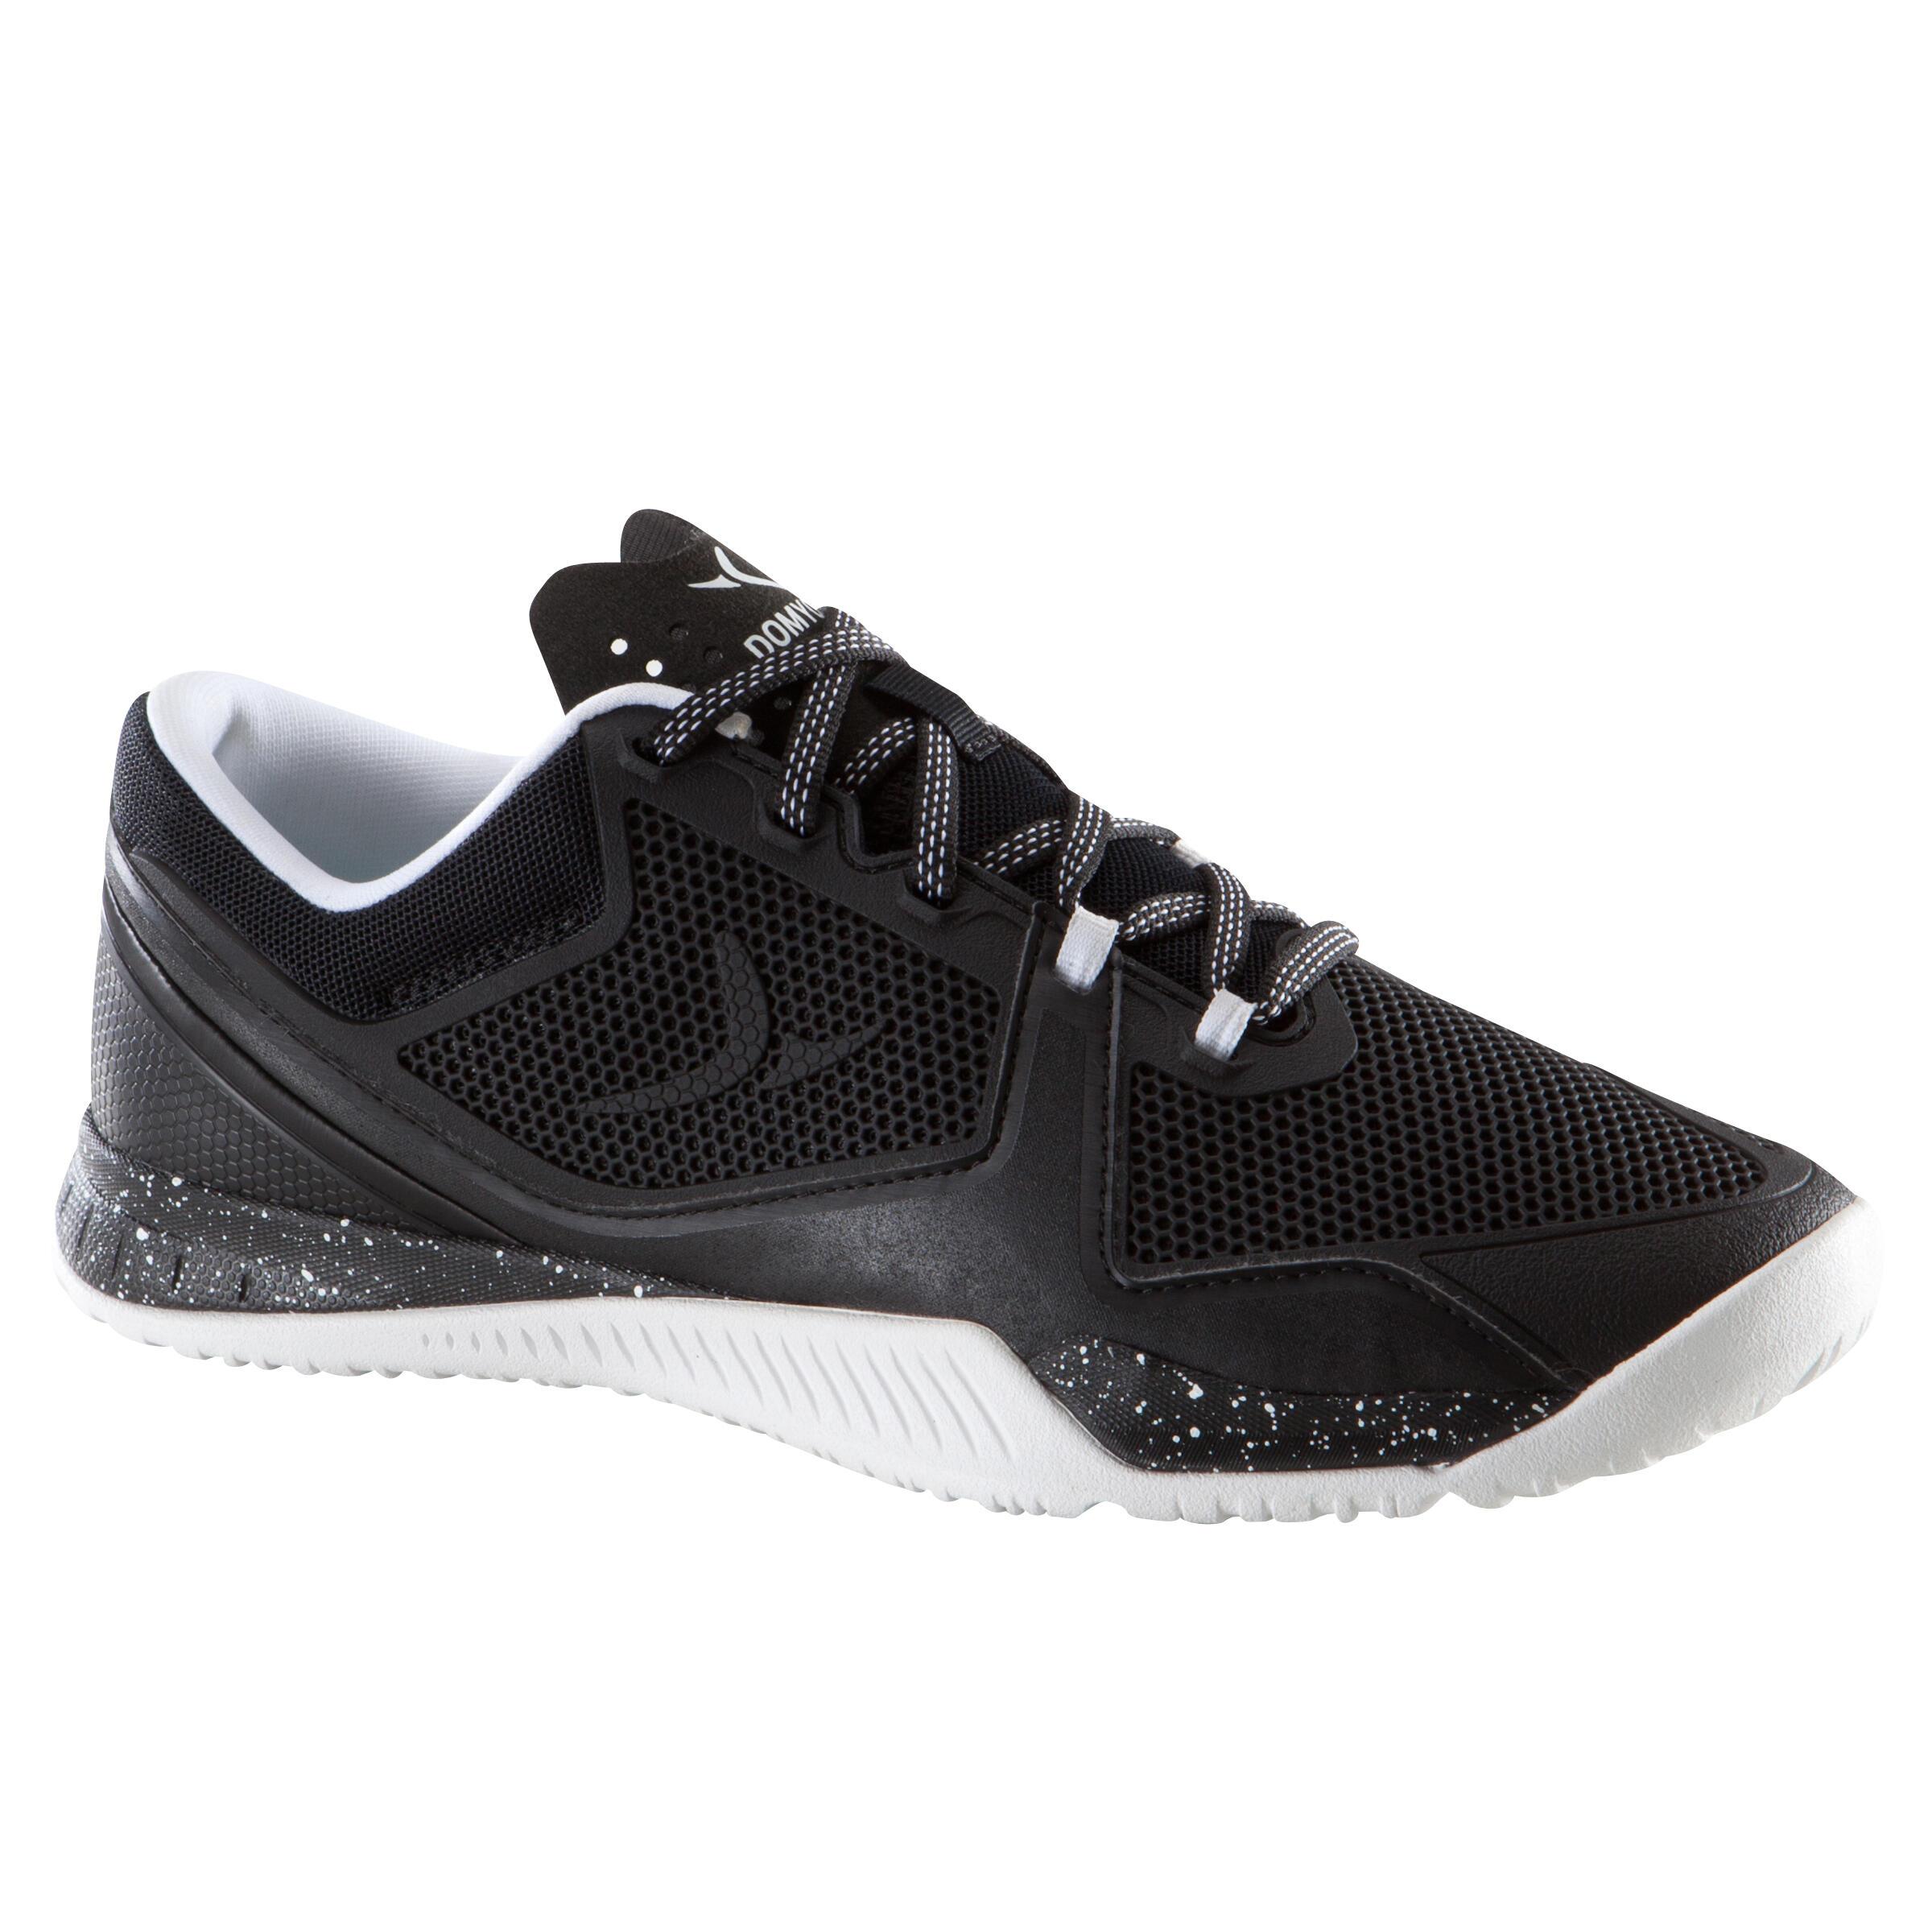 Chaussure de cross-fit femme noir et blanche Strong 900